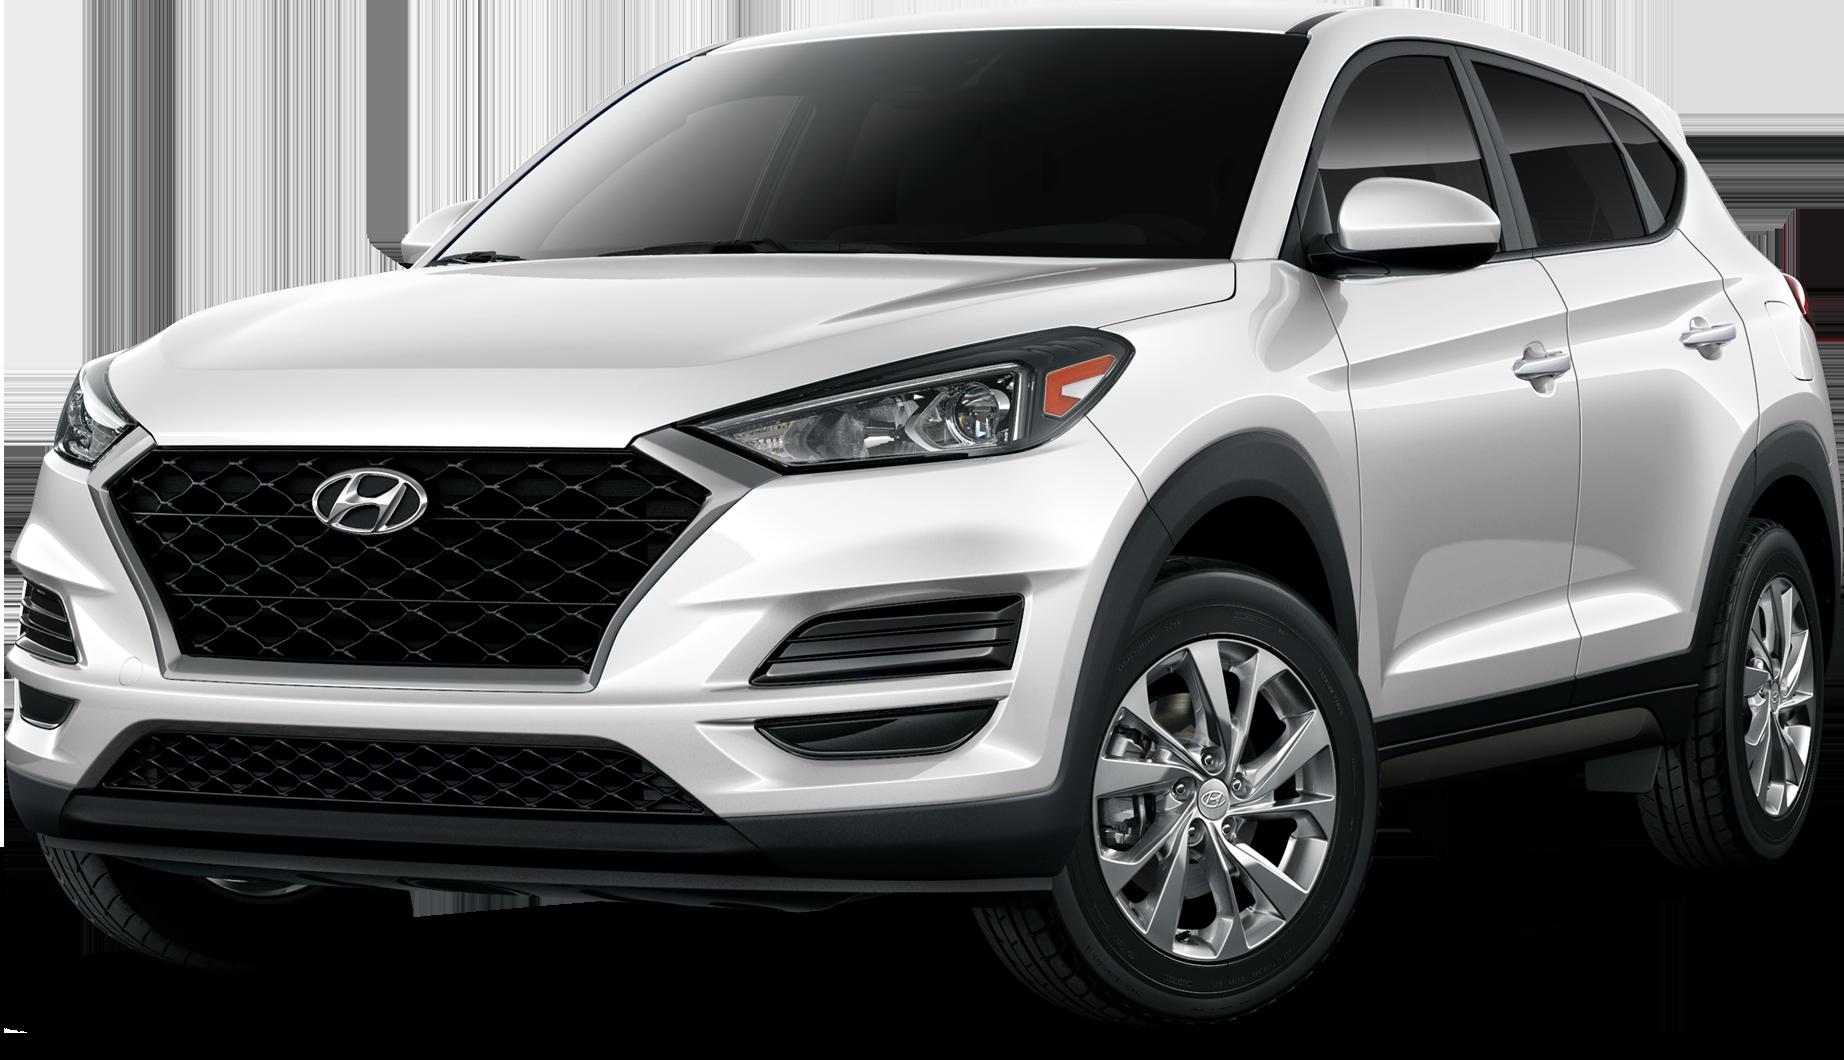 2020 Hyundai Tucson Incentives Specials Offers In Plantation Fl